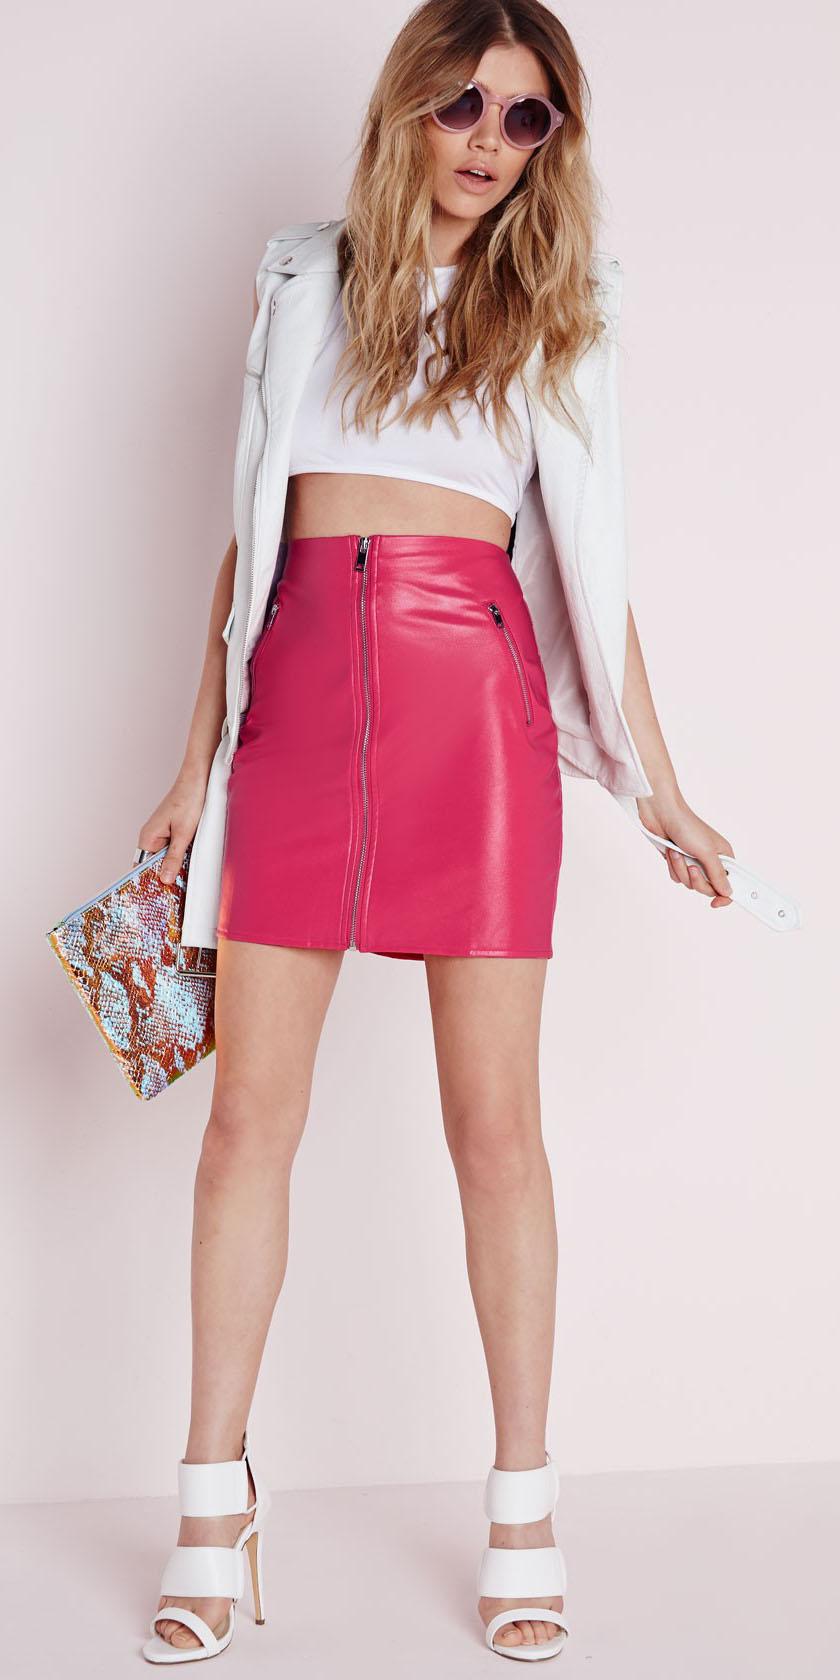 pink-magenta-mini-skirt-white-crop-top-white-vest-white-shoe-sandalh-sun-blue-bag-clutch-spring-summer-blonde-dinner.jpg